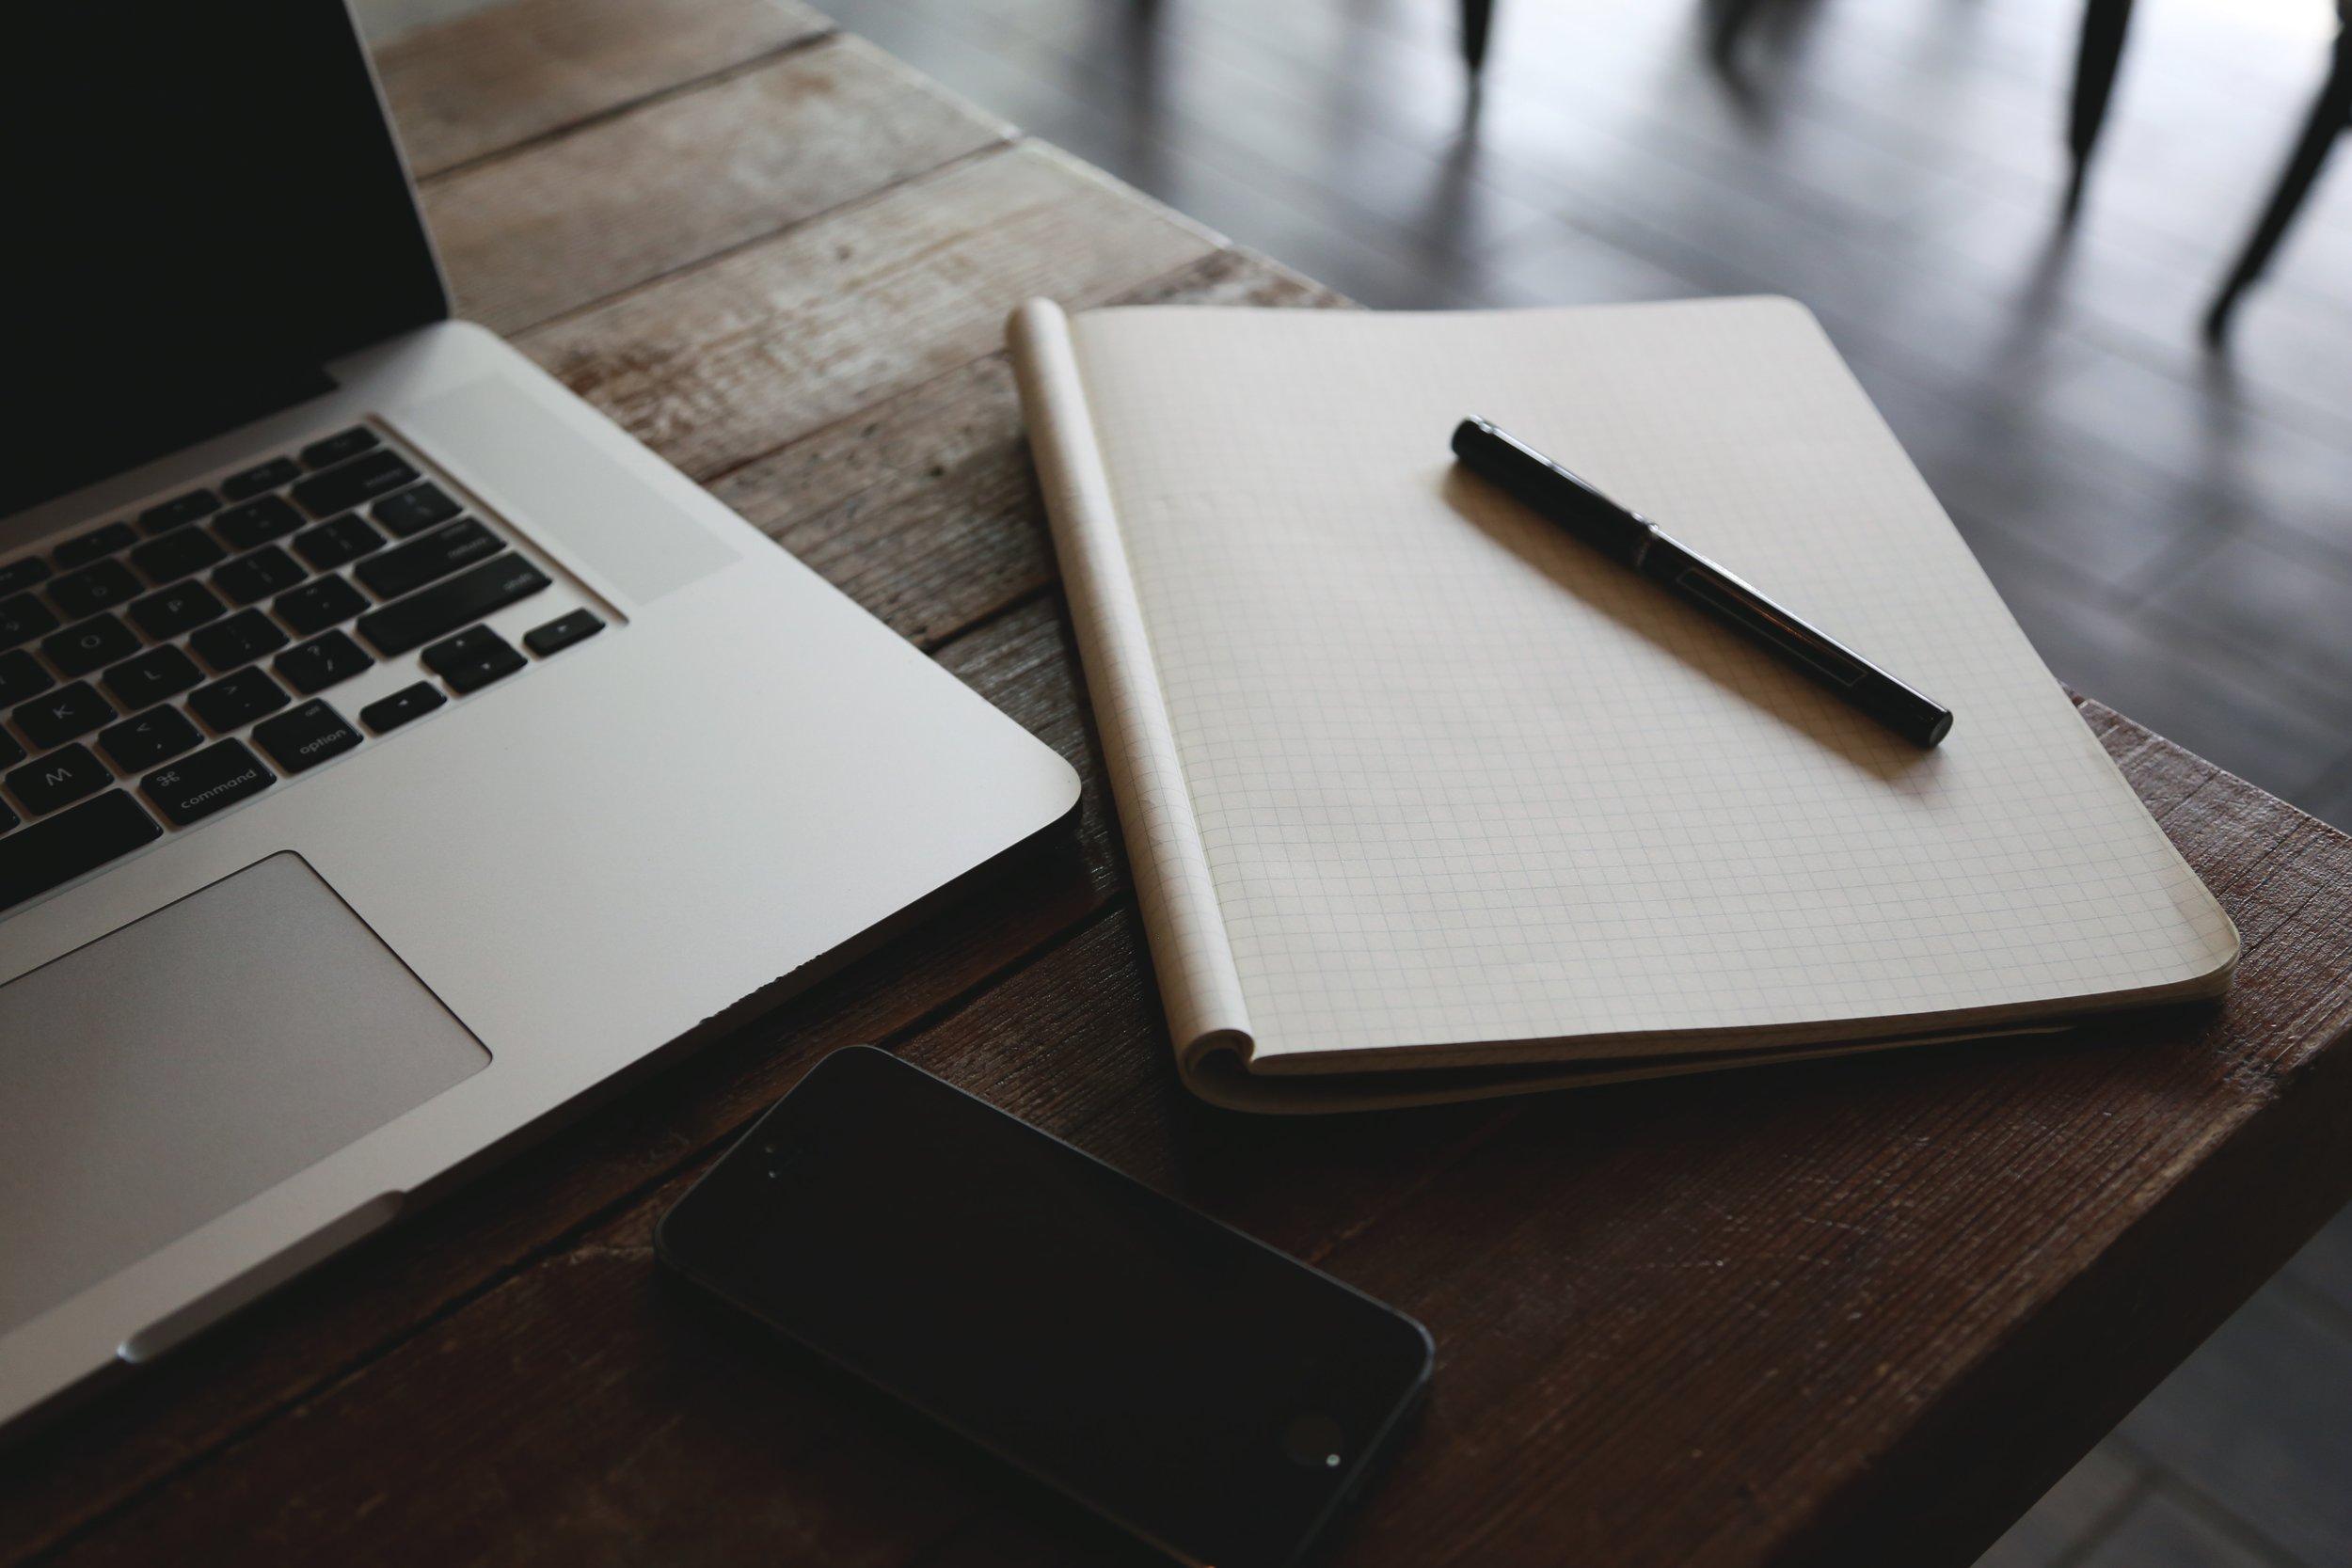 iphone-desk-laptop-notebook.jpg